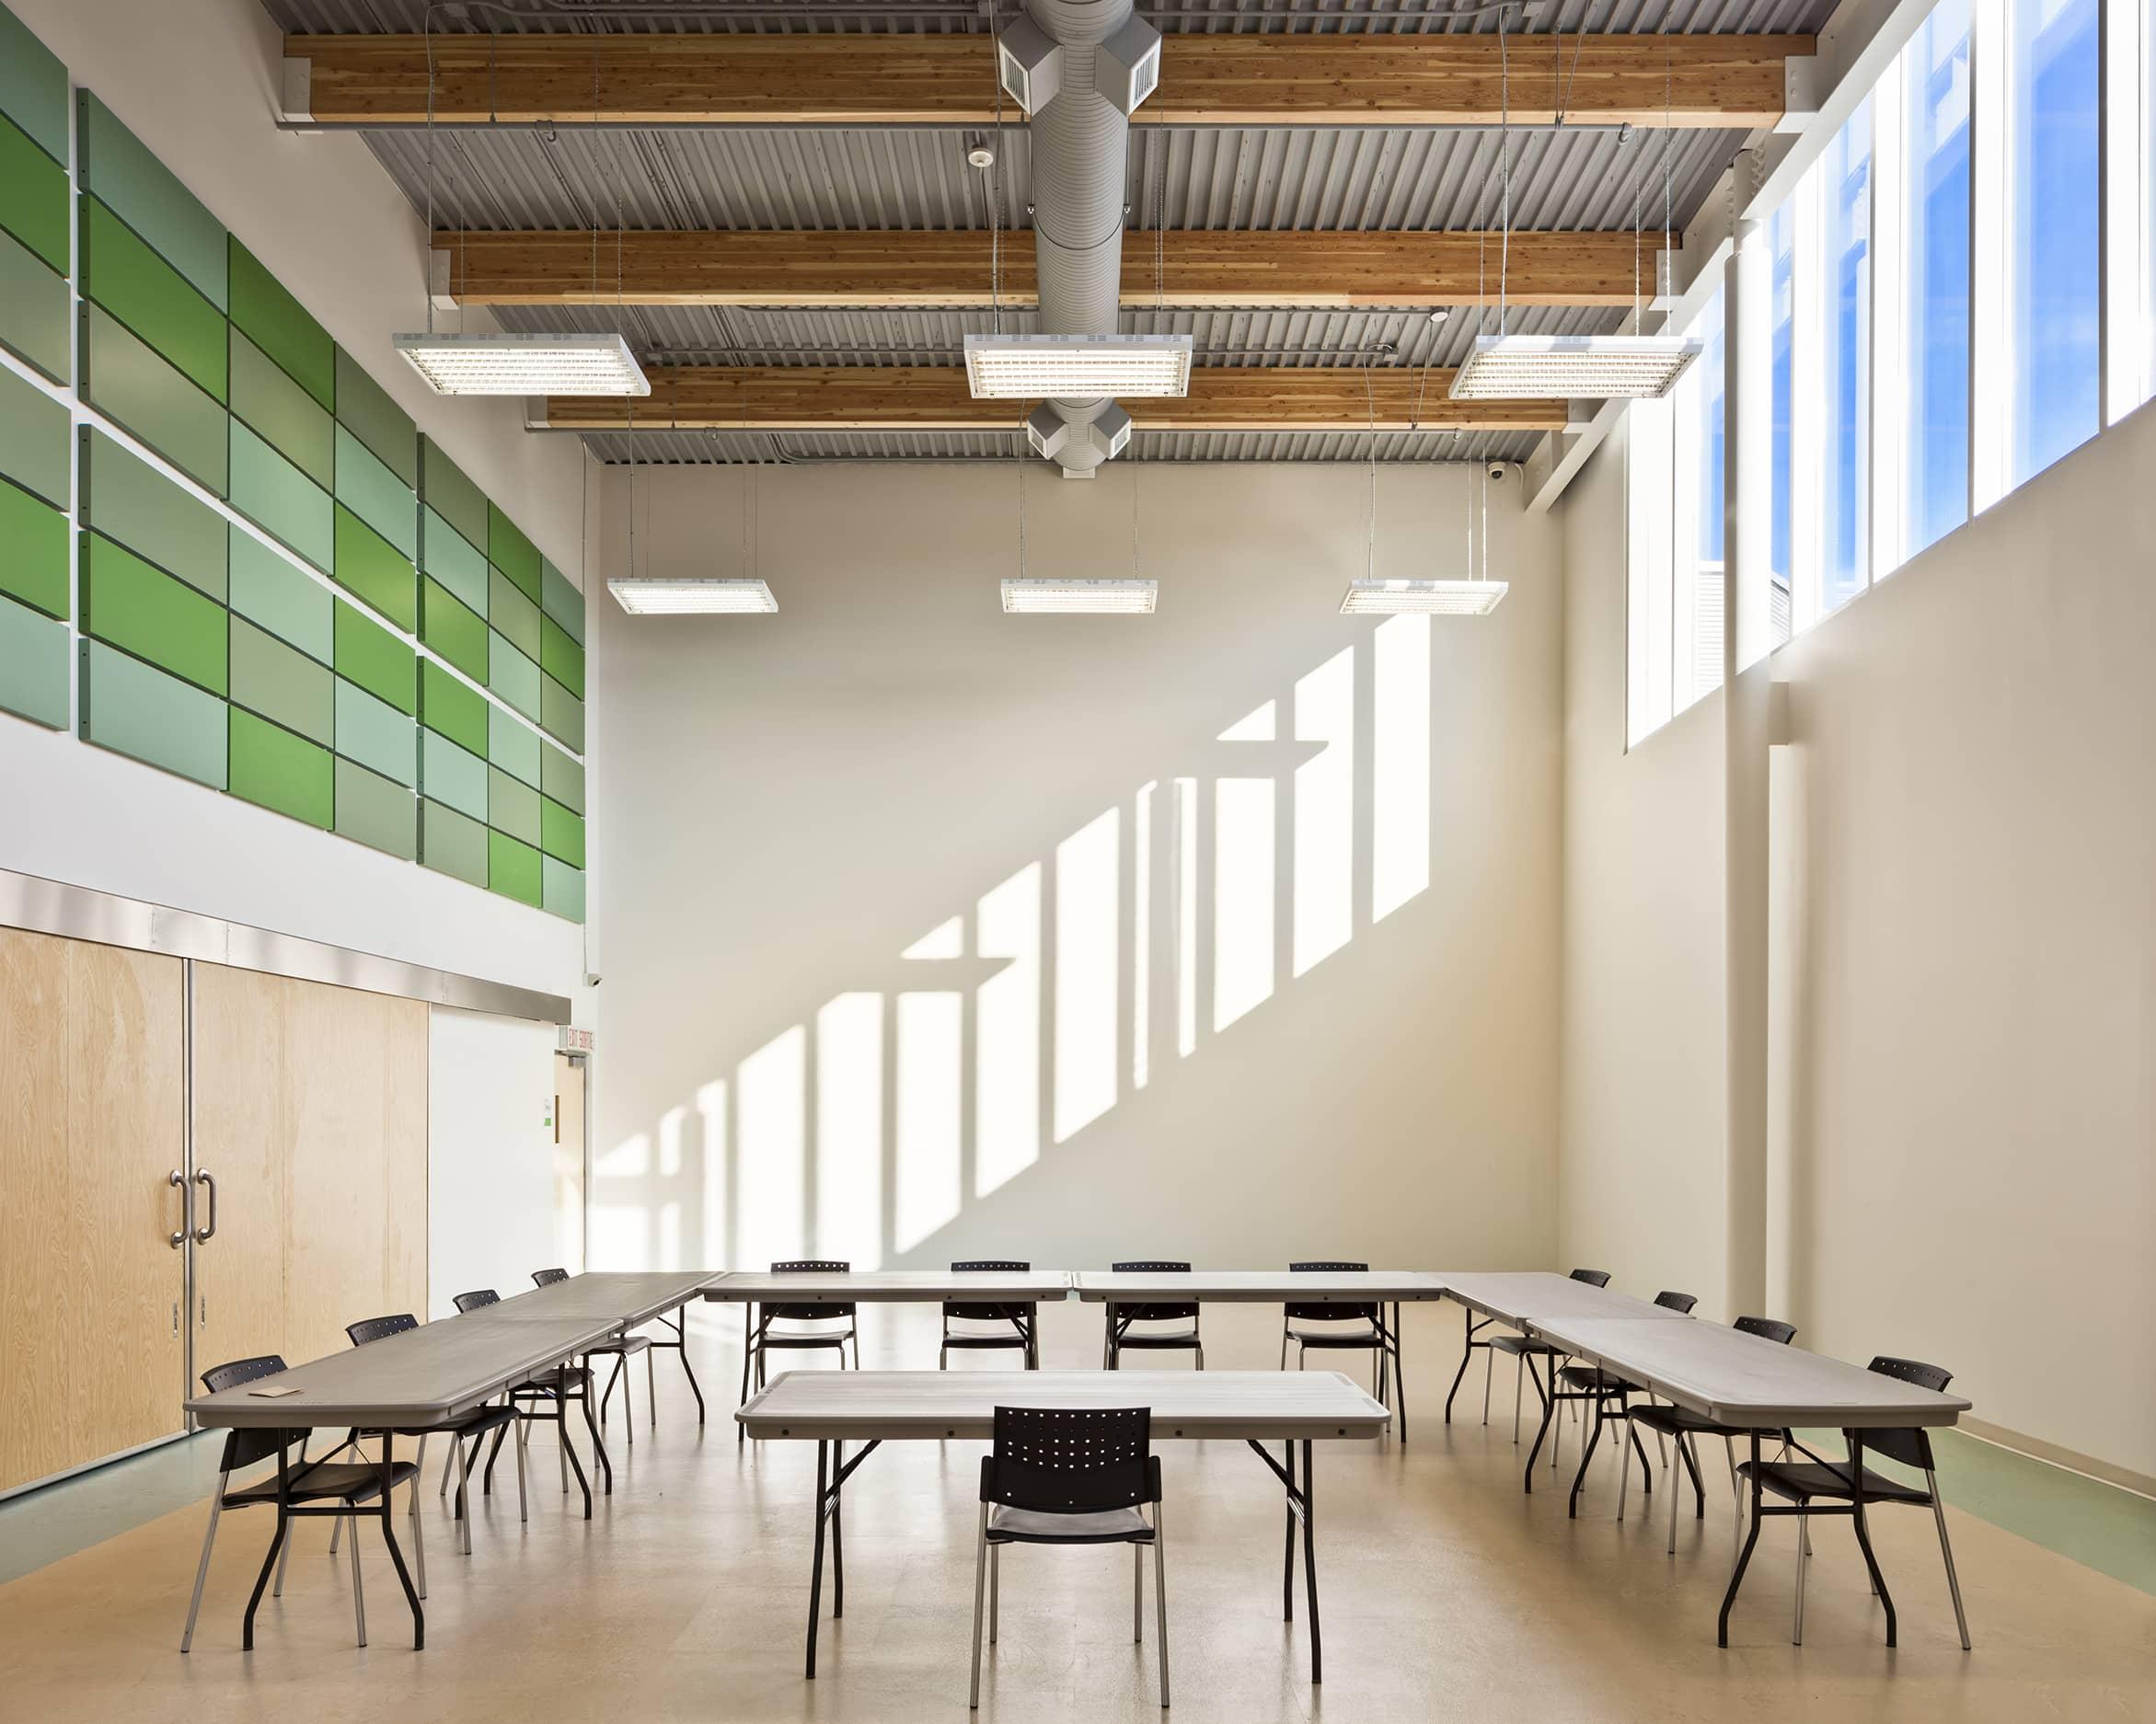 bbp whitehorse correctional centre classroom